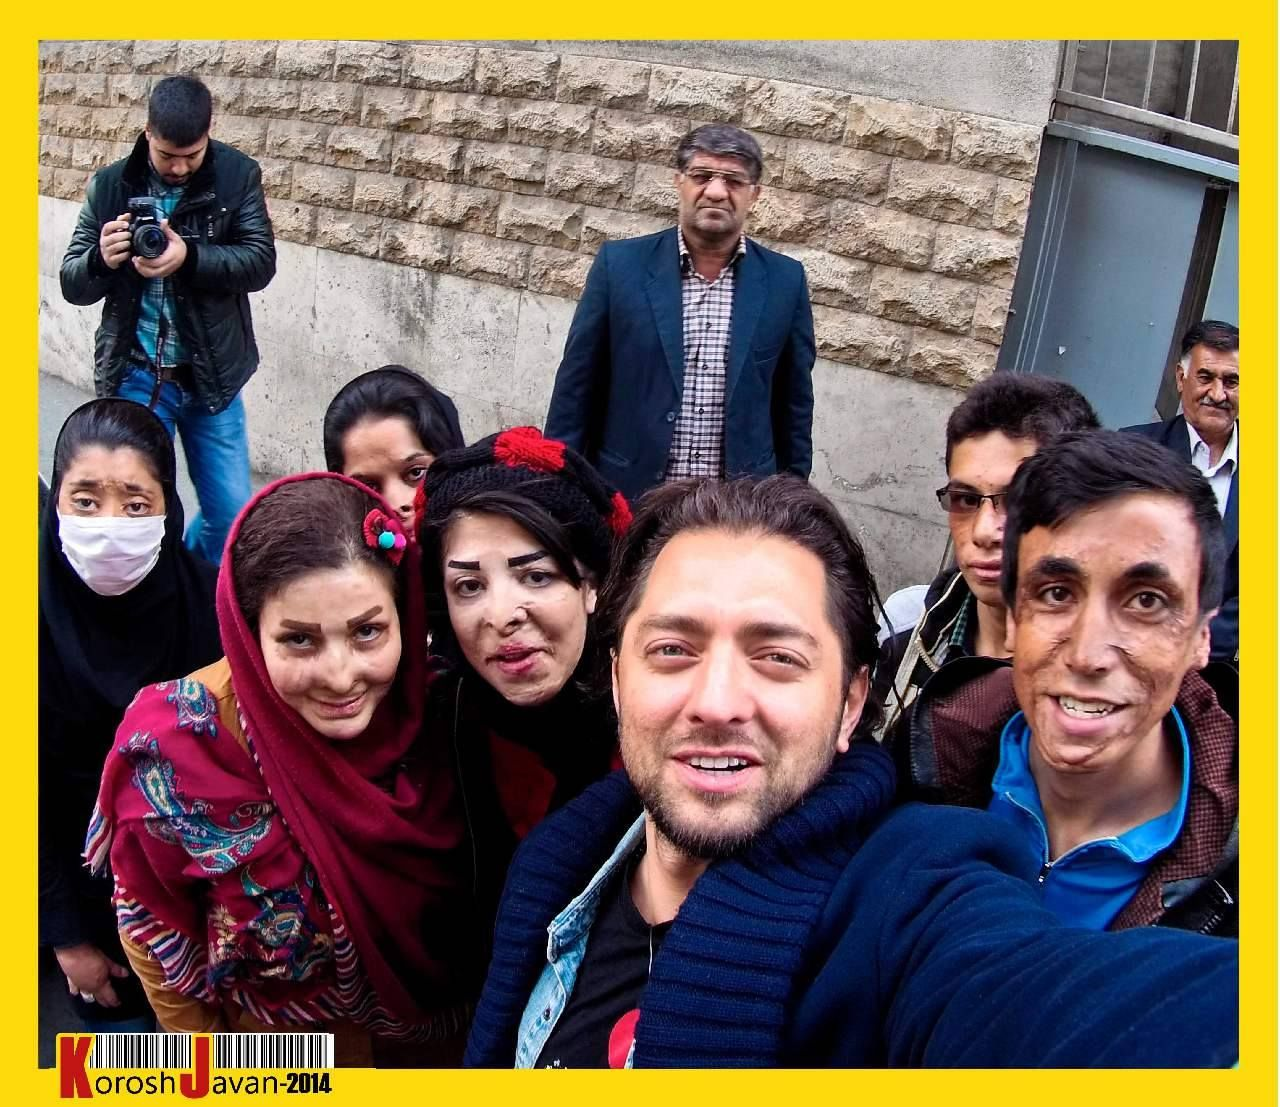 ♥ - bahramradan - bahram radan - بهرام رادان - اهدای کمک های جمع شده به بچه های مرودشت